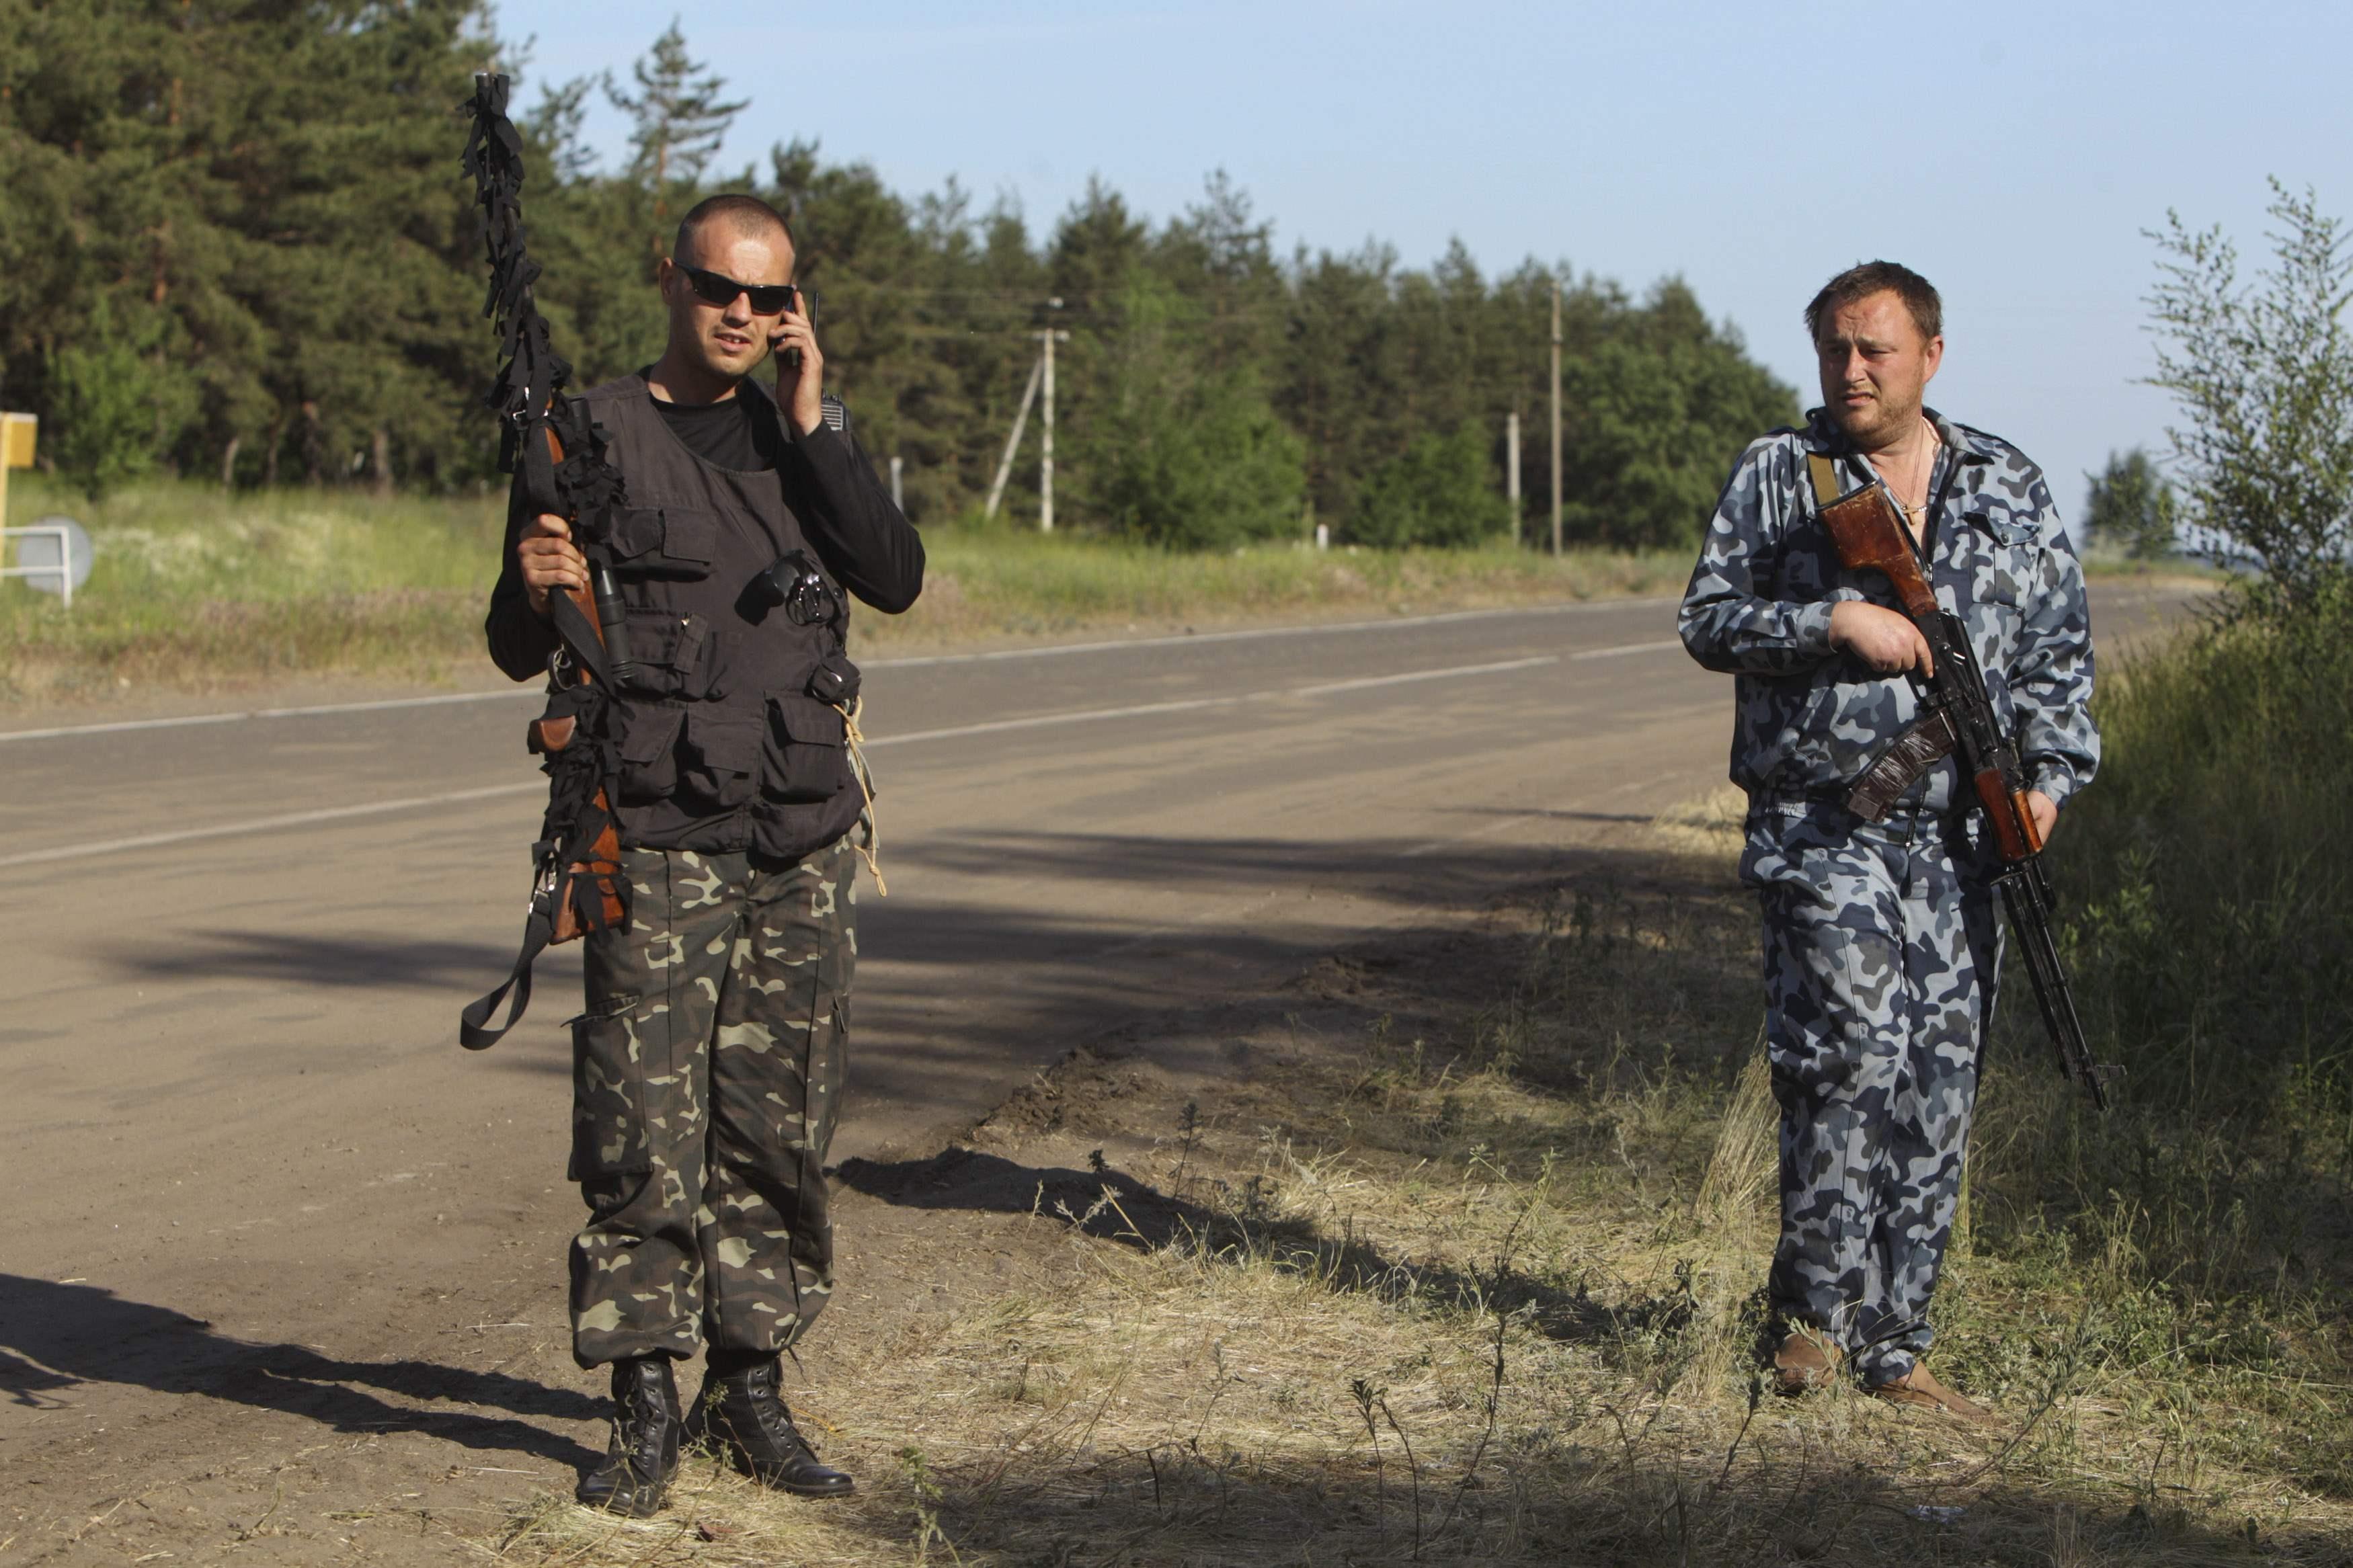 Report: 14 Ukrainians Killed in Clash with Separatists